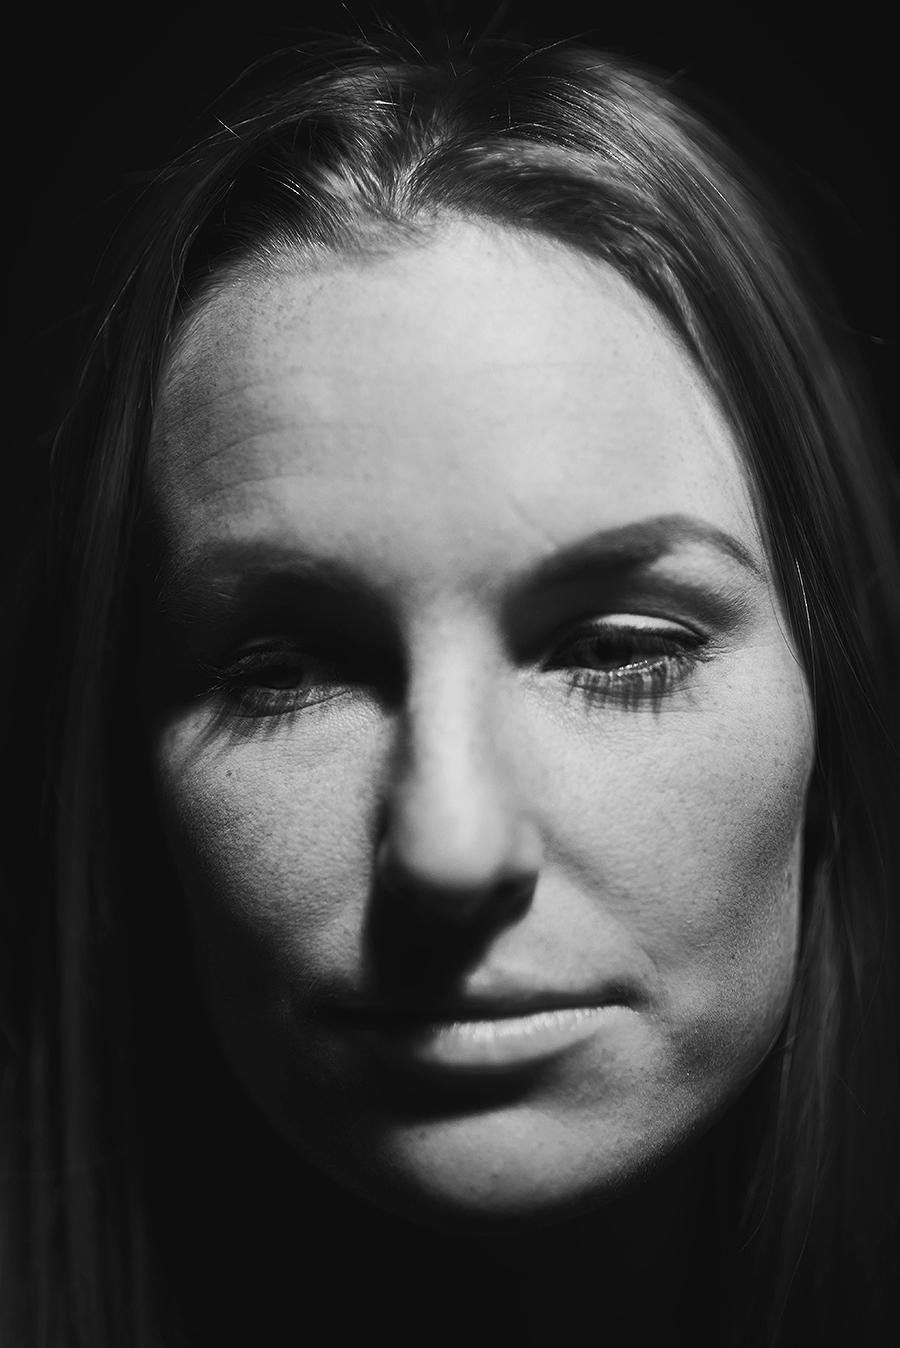 Devon_A1_Sadness_photography_model_photo_emotion_portrait_headshot_kaleb_germinaro.jpg